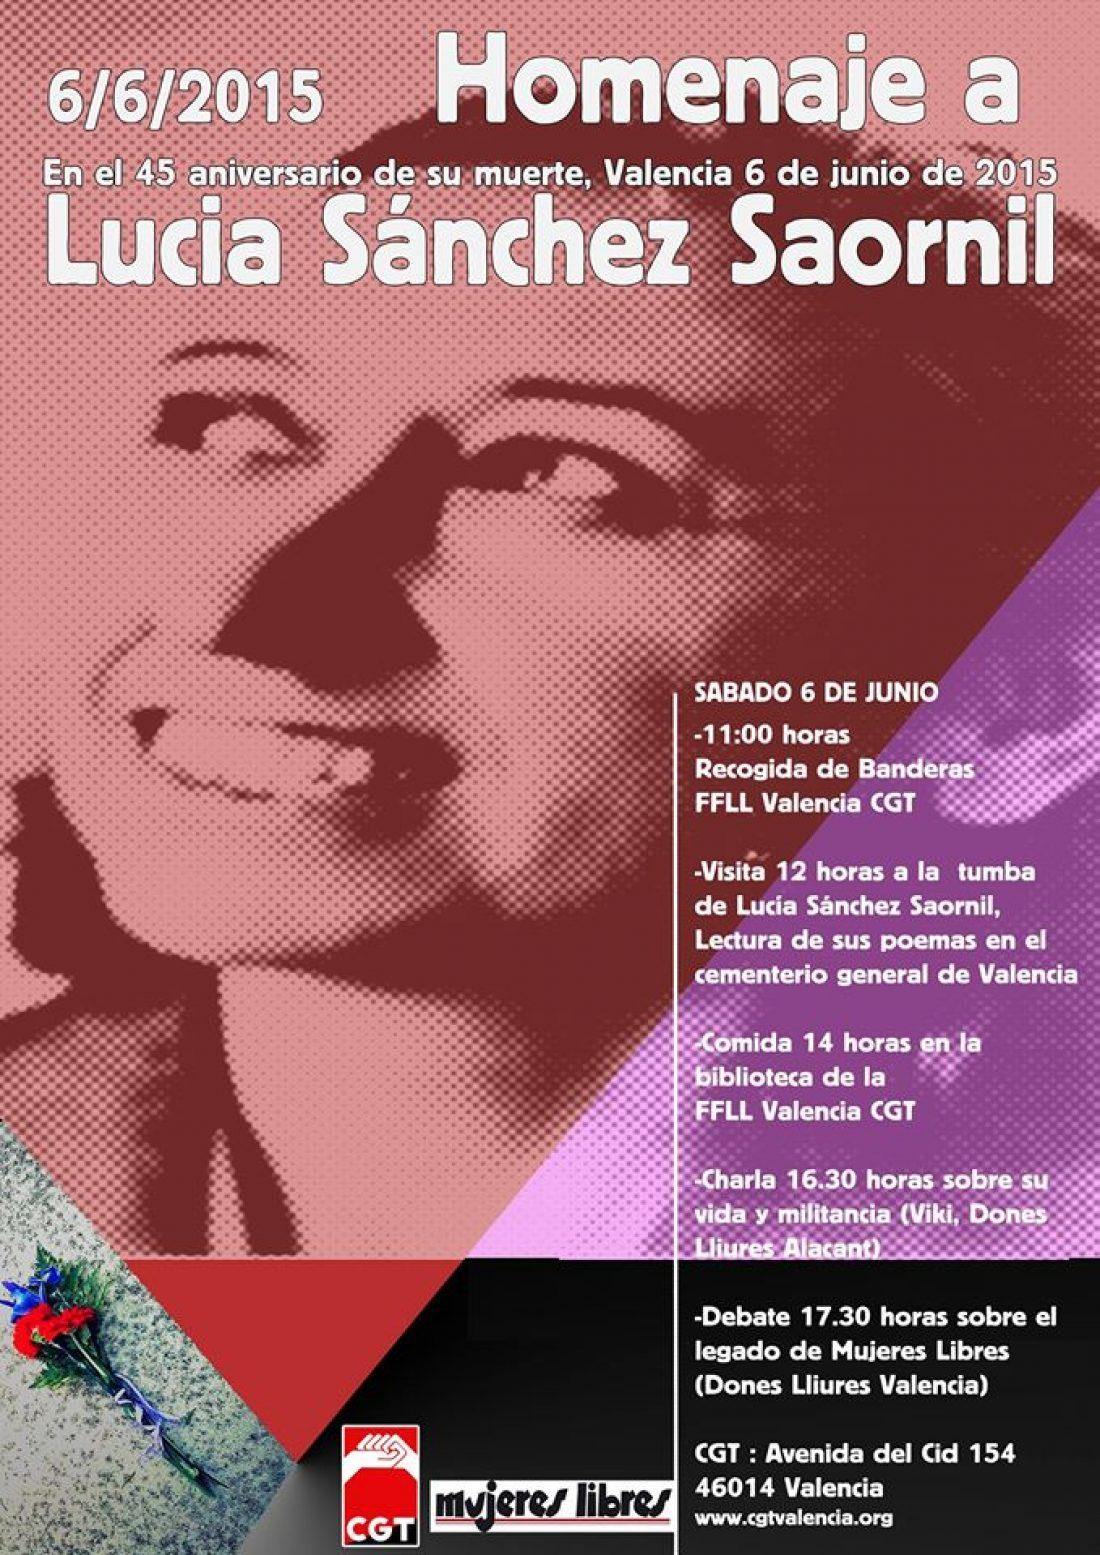 Homenatge a Lucía Sánchez Saornil